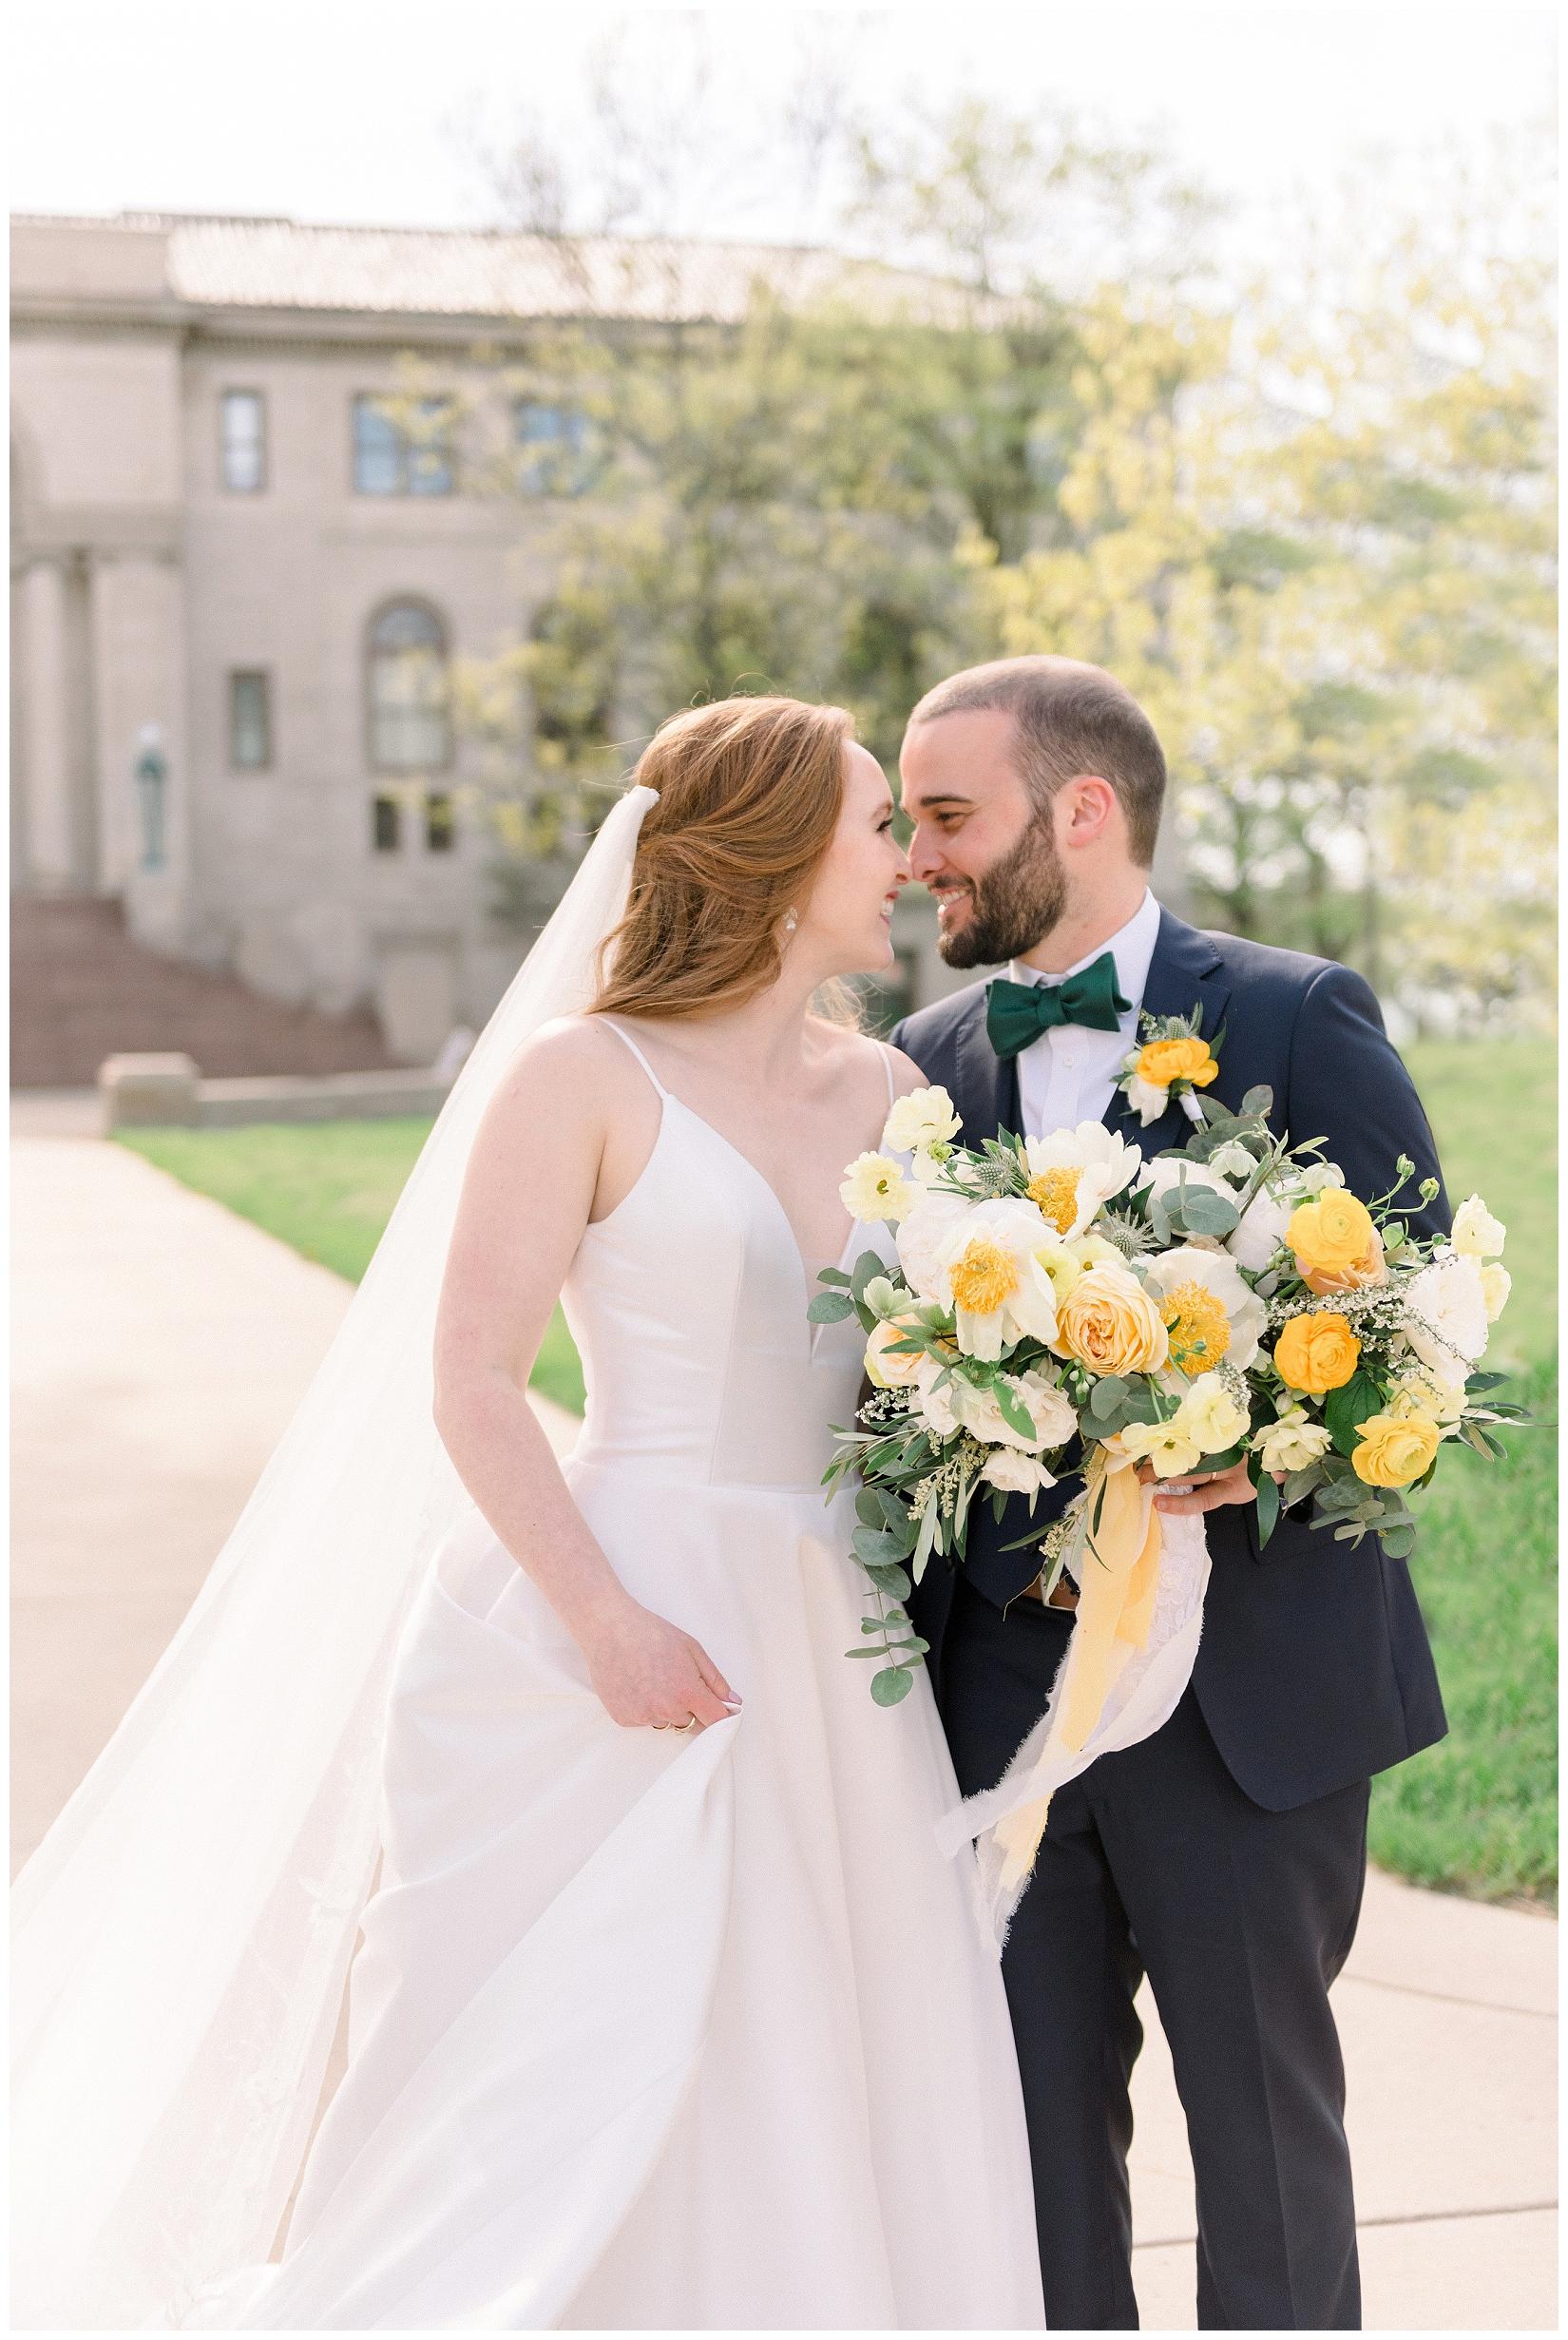 cat-alkire-wedding-photographer-indiana-chicago-indianapolis-fort-wayne_1222.jpg